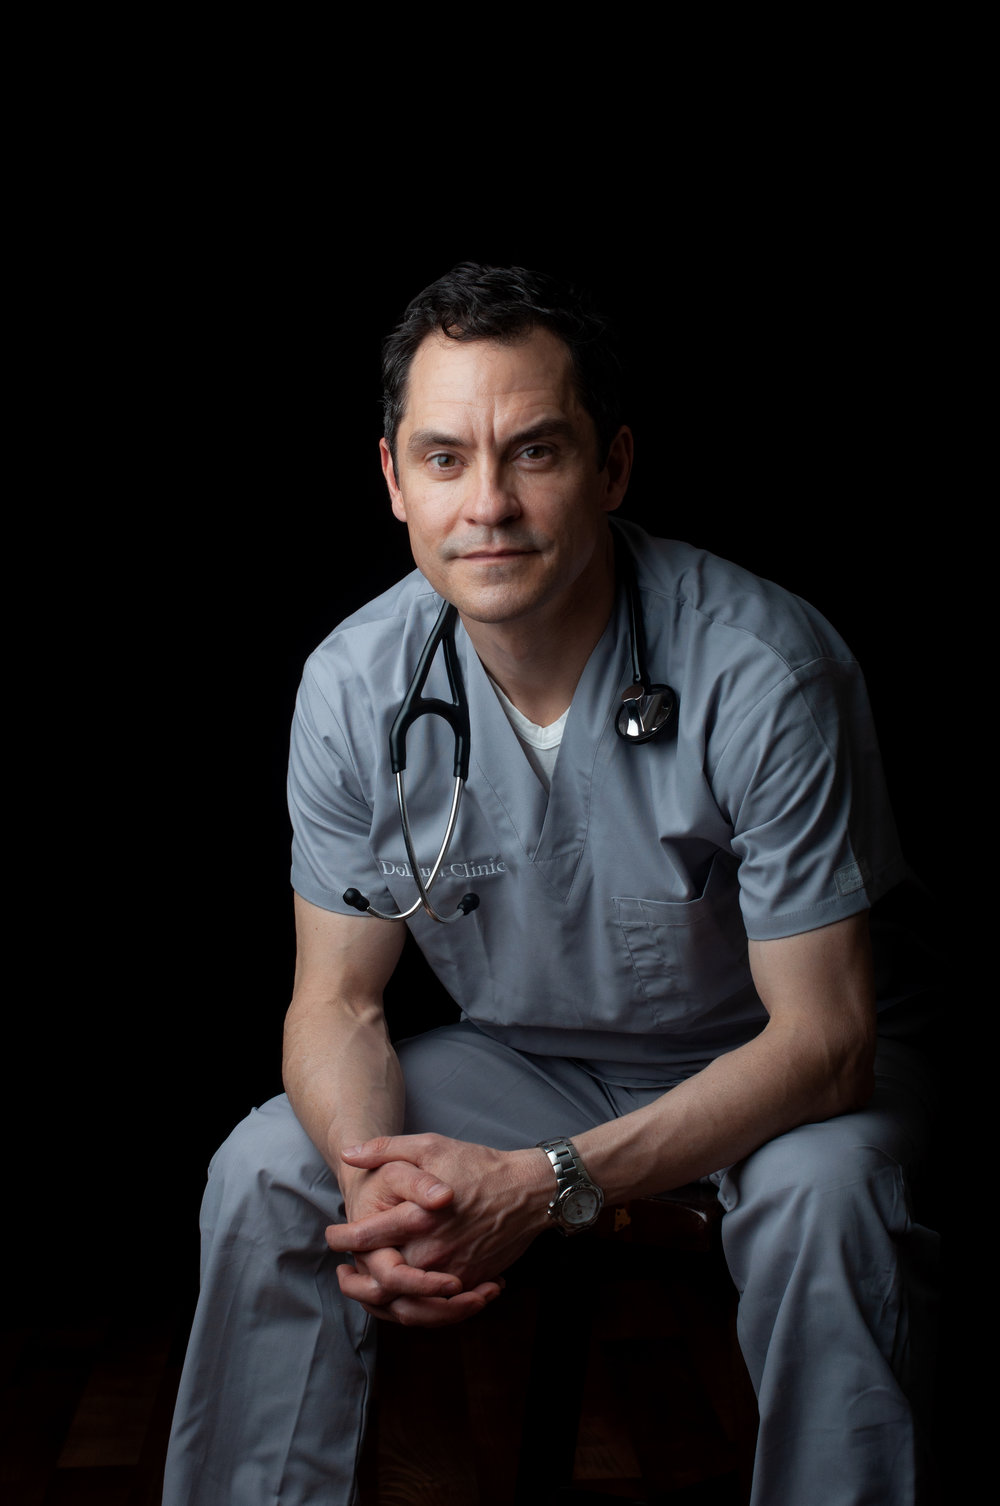 Story — Dolhun Clinic Pre-Medical Internship